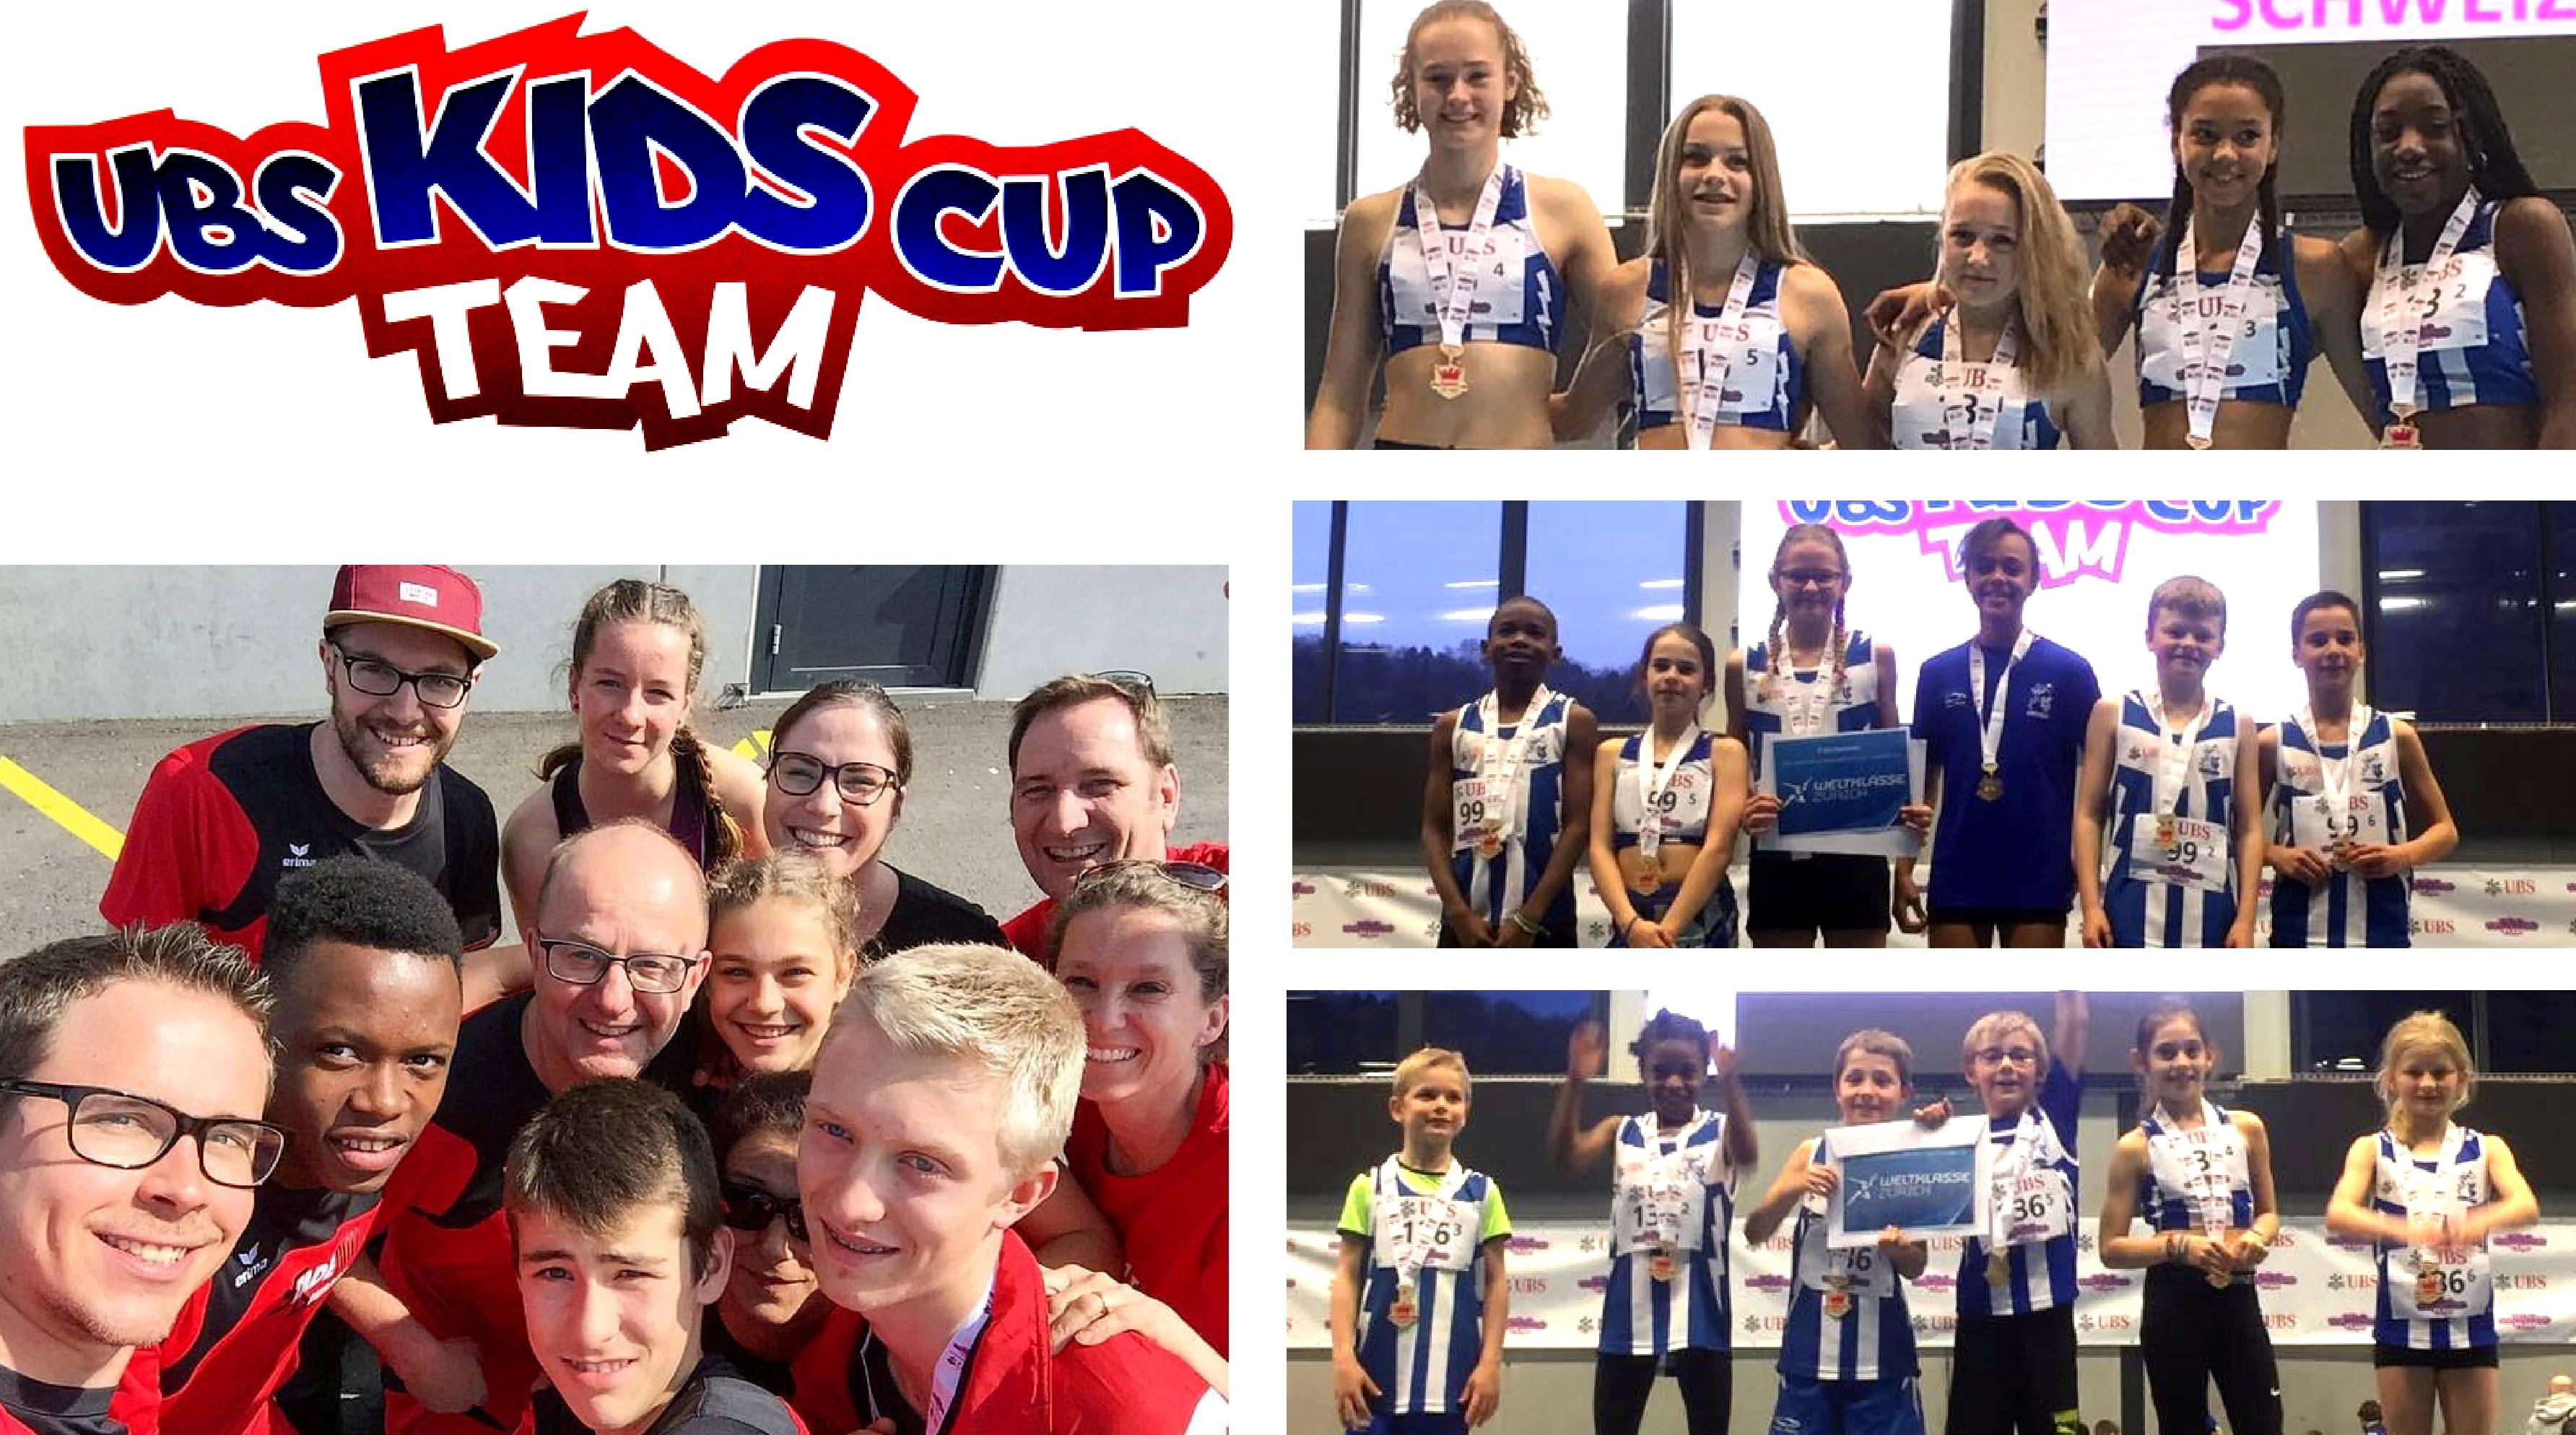 UBS Kids Cup Team à Untersiggenthal